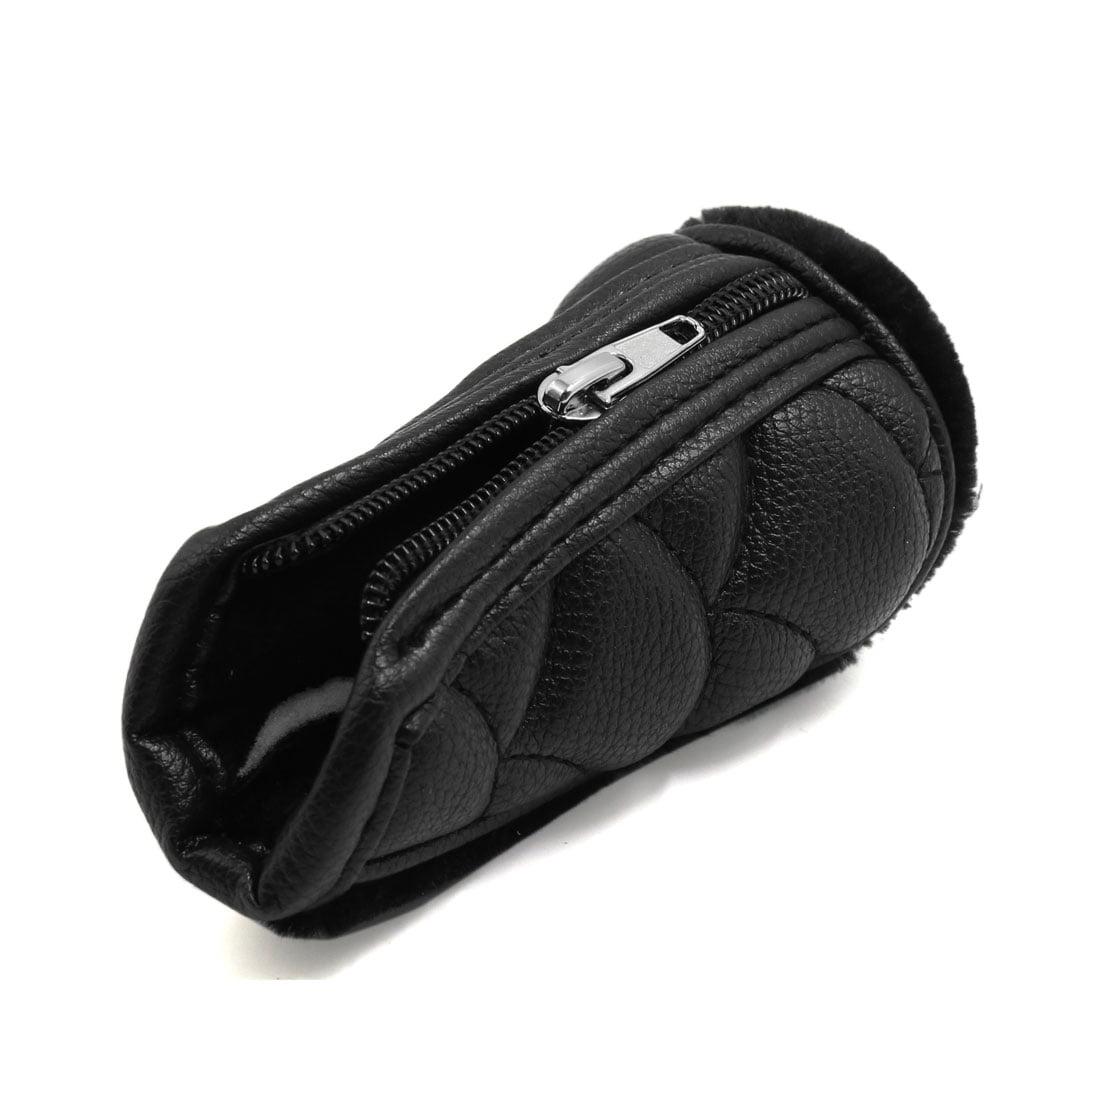 Faux Leather Flannel Zipper Closure Car Gear Shift Lever Knob Cover Black - image 1 of 2